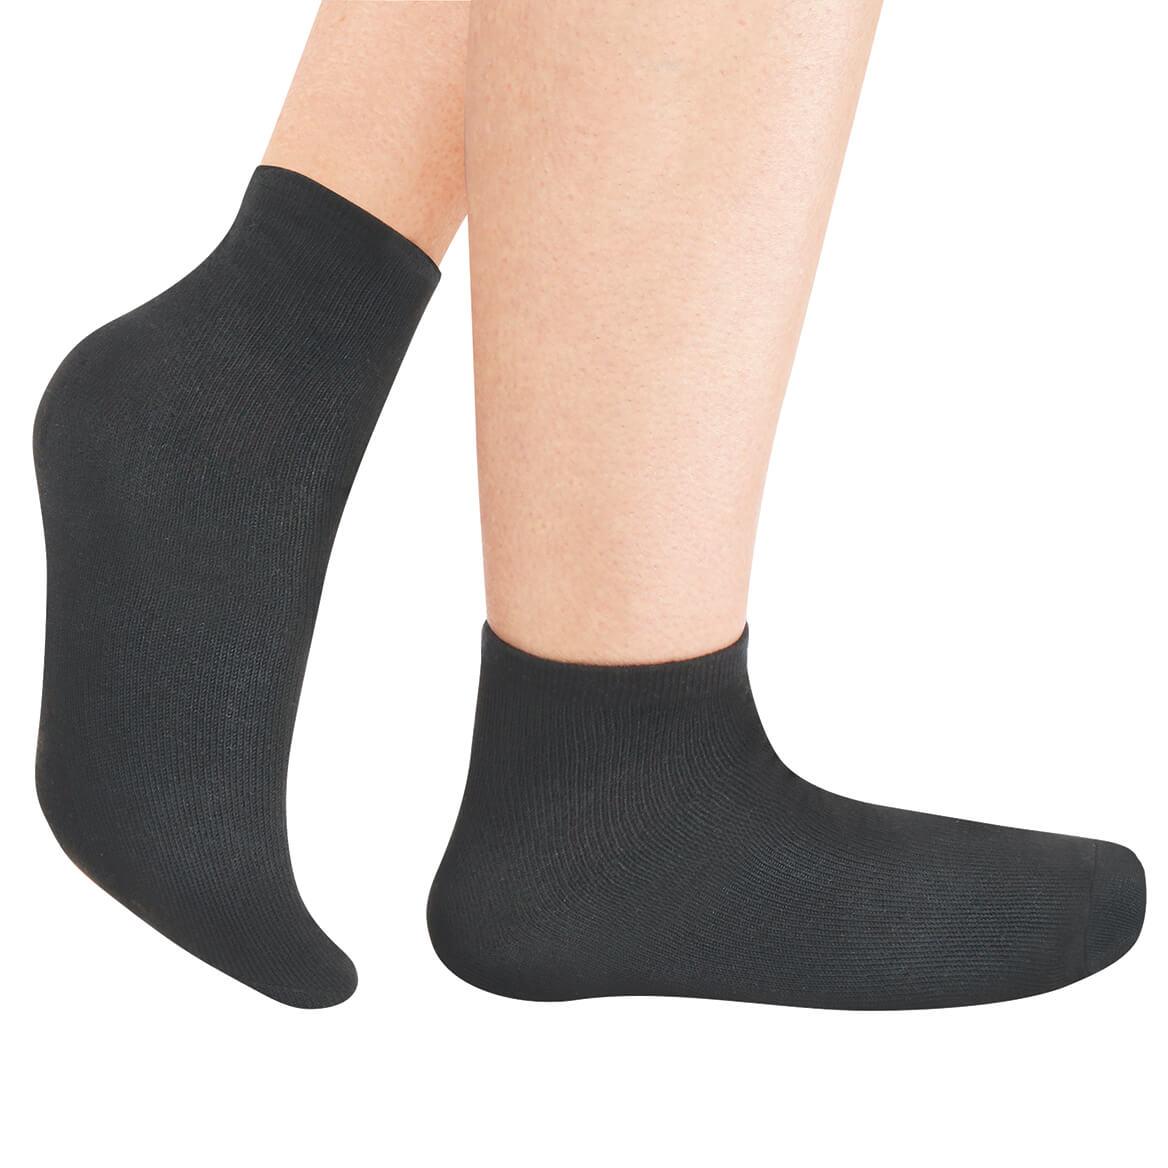 Neuropathy Therapy Socks-369995